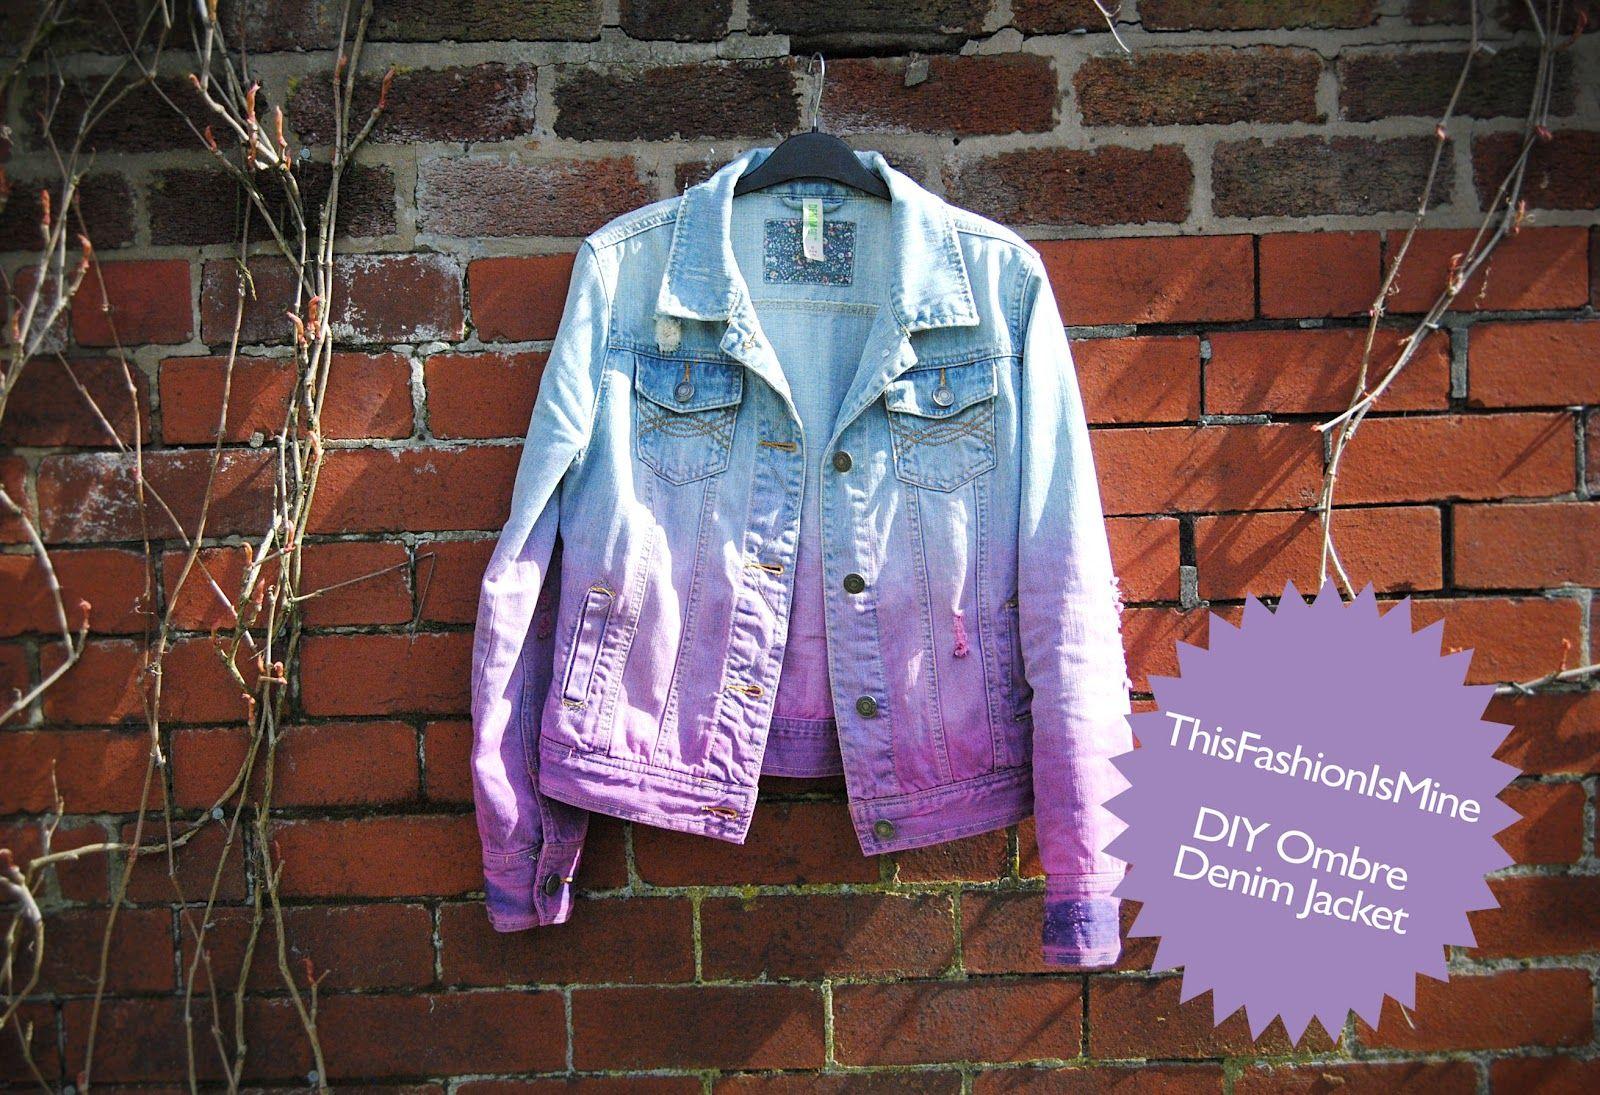 This Fashion Is Mine Dip Dye Ombre Denim Jacket Diy Diy Denim Jacket Diy Clothes Jackets Denim Dye [ 1095 x 1600 Pixel ]